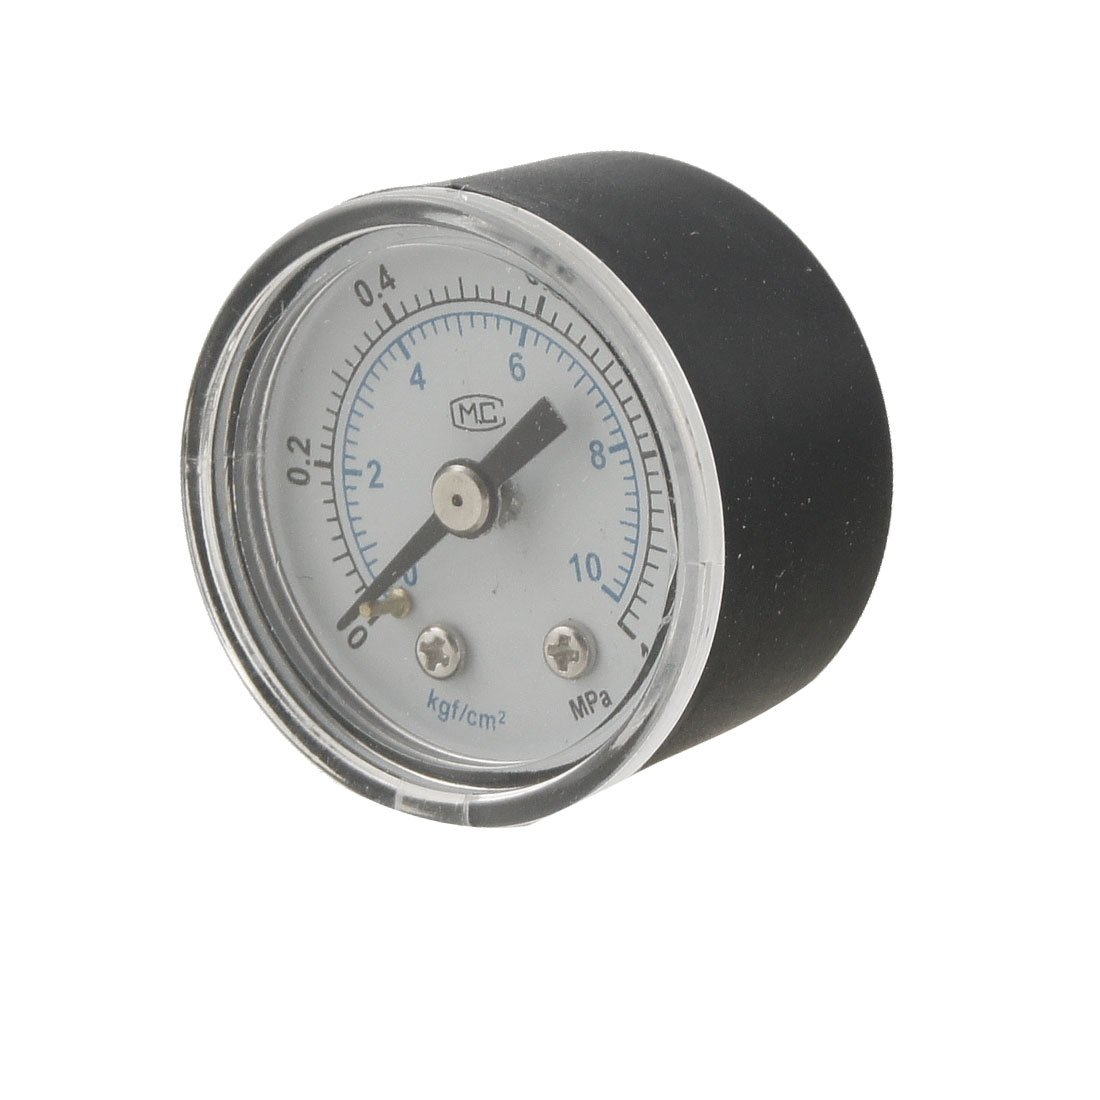 0-1MPa 0.37' Threaded Dial Air Compressor Pressure Gauge Sourcingmap a12052900ux0301